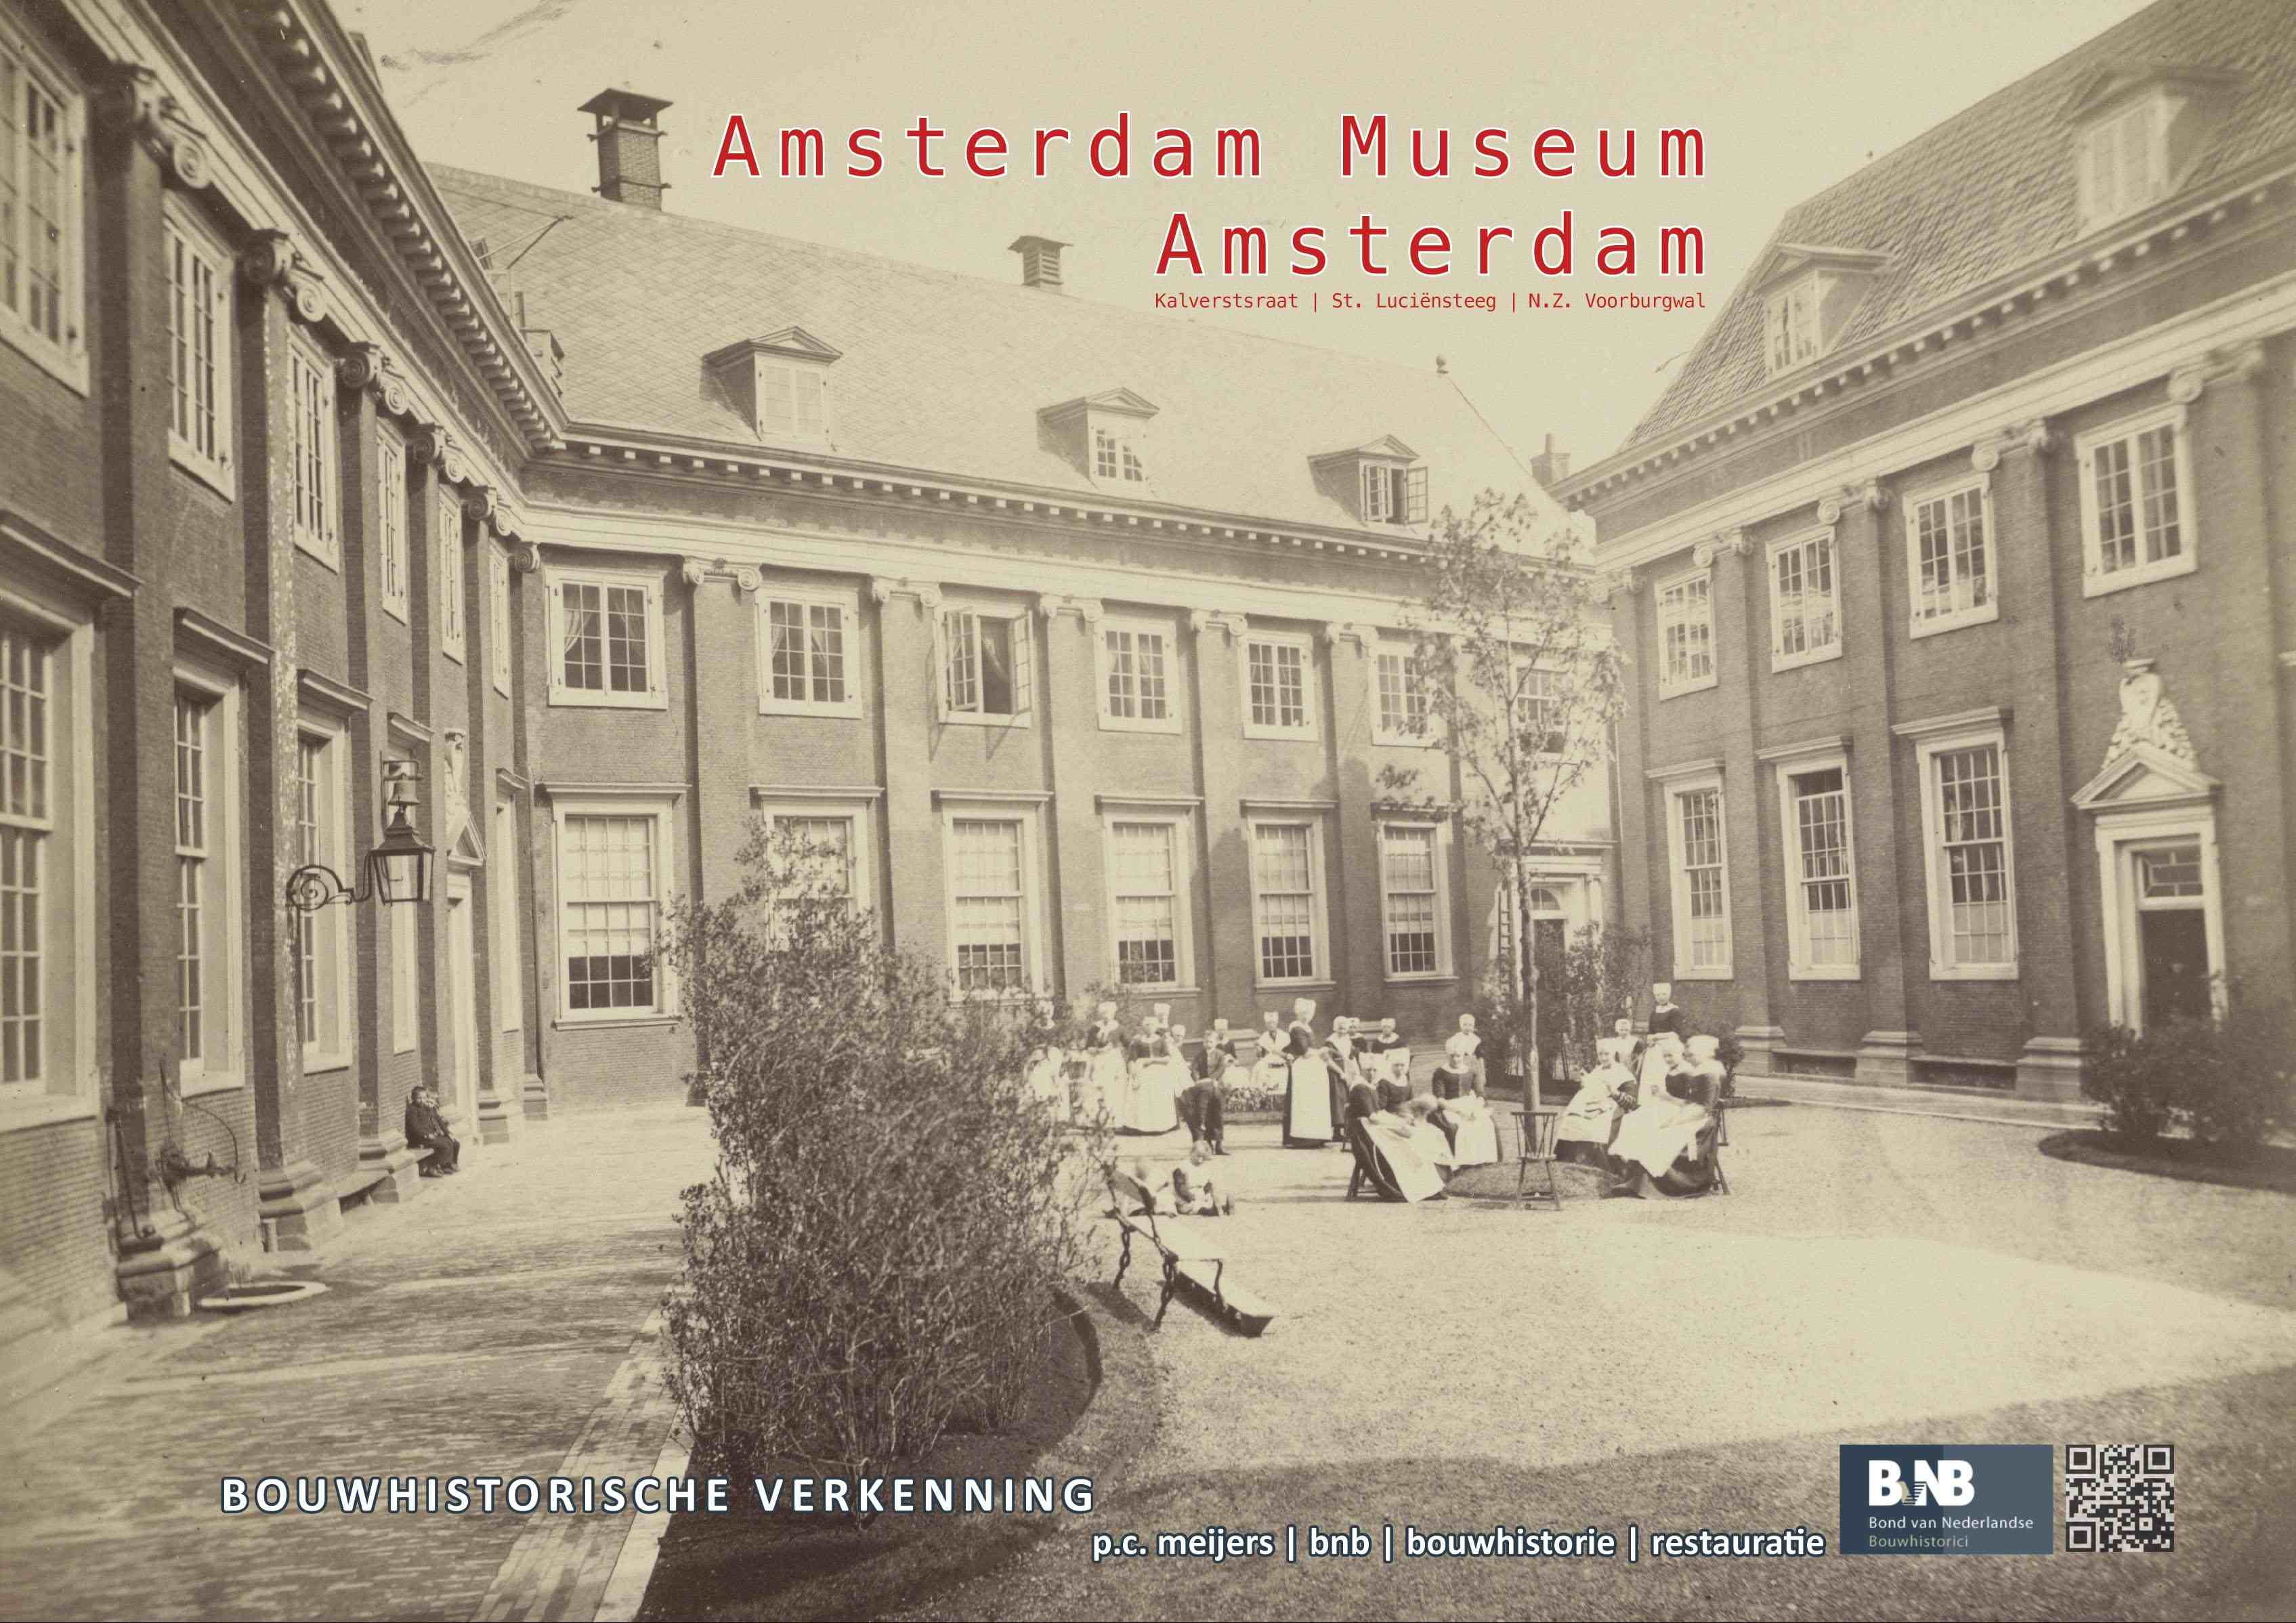 Amsterdam Museum, Kalverstraat 92, Amsterdam